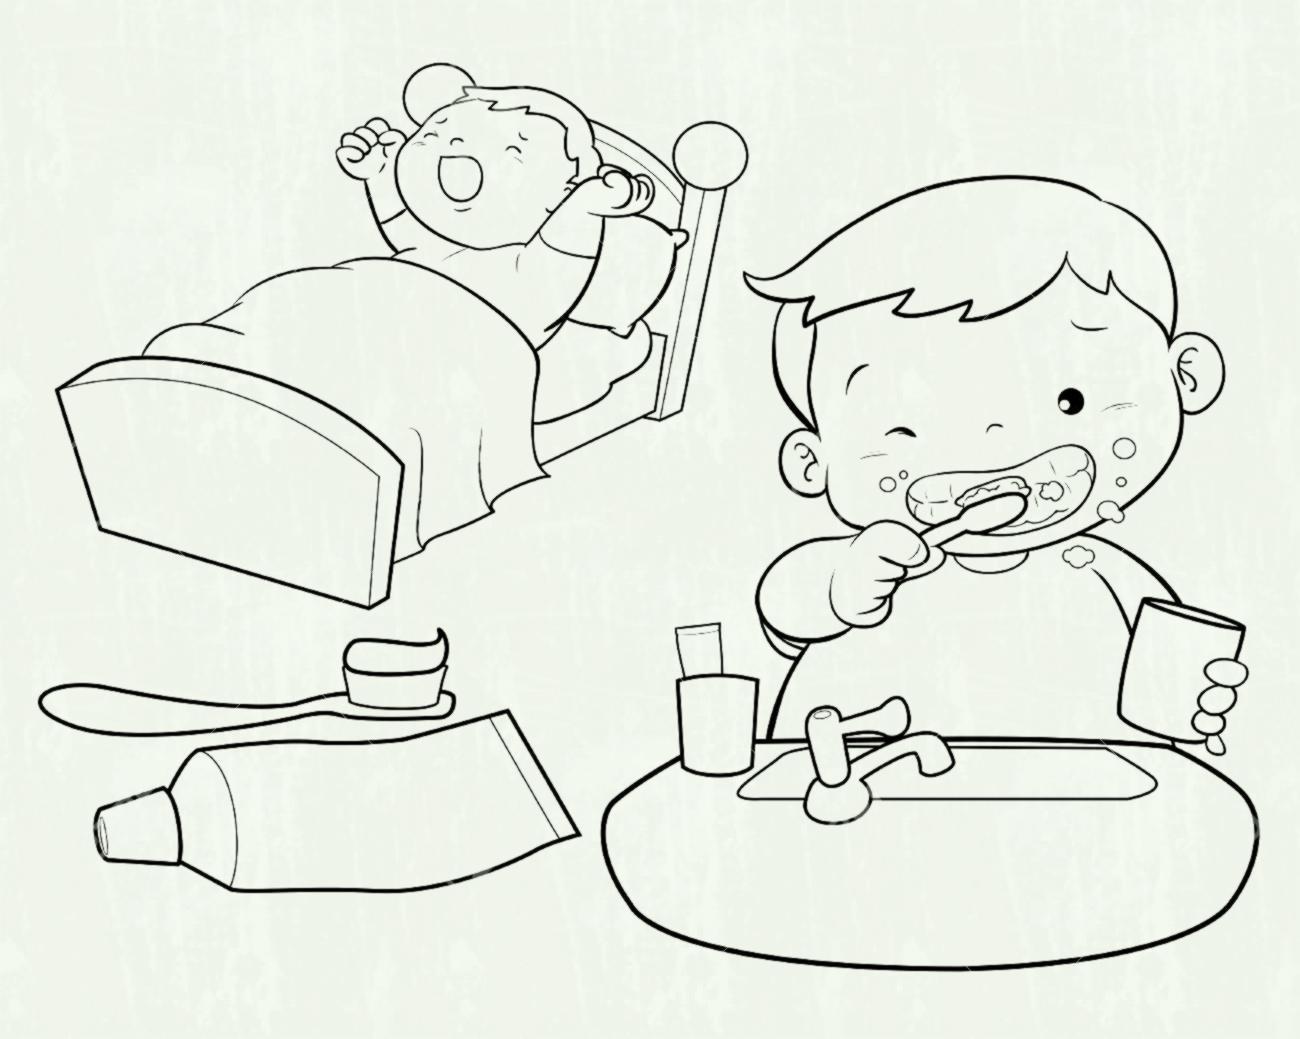 Boy brushing teeth clipart black and white jpg freeuse Boy Brushing Teeth Clipart (98+ images in Collection) Page 1 jpg freeuse